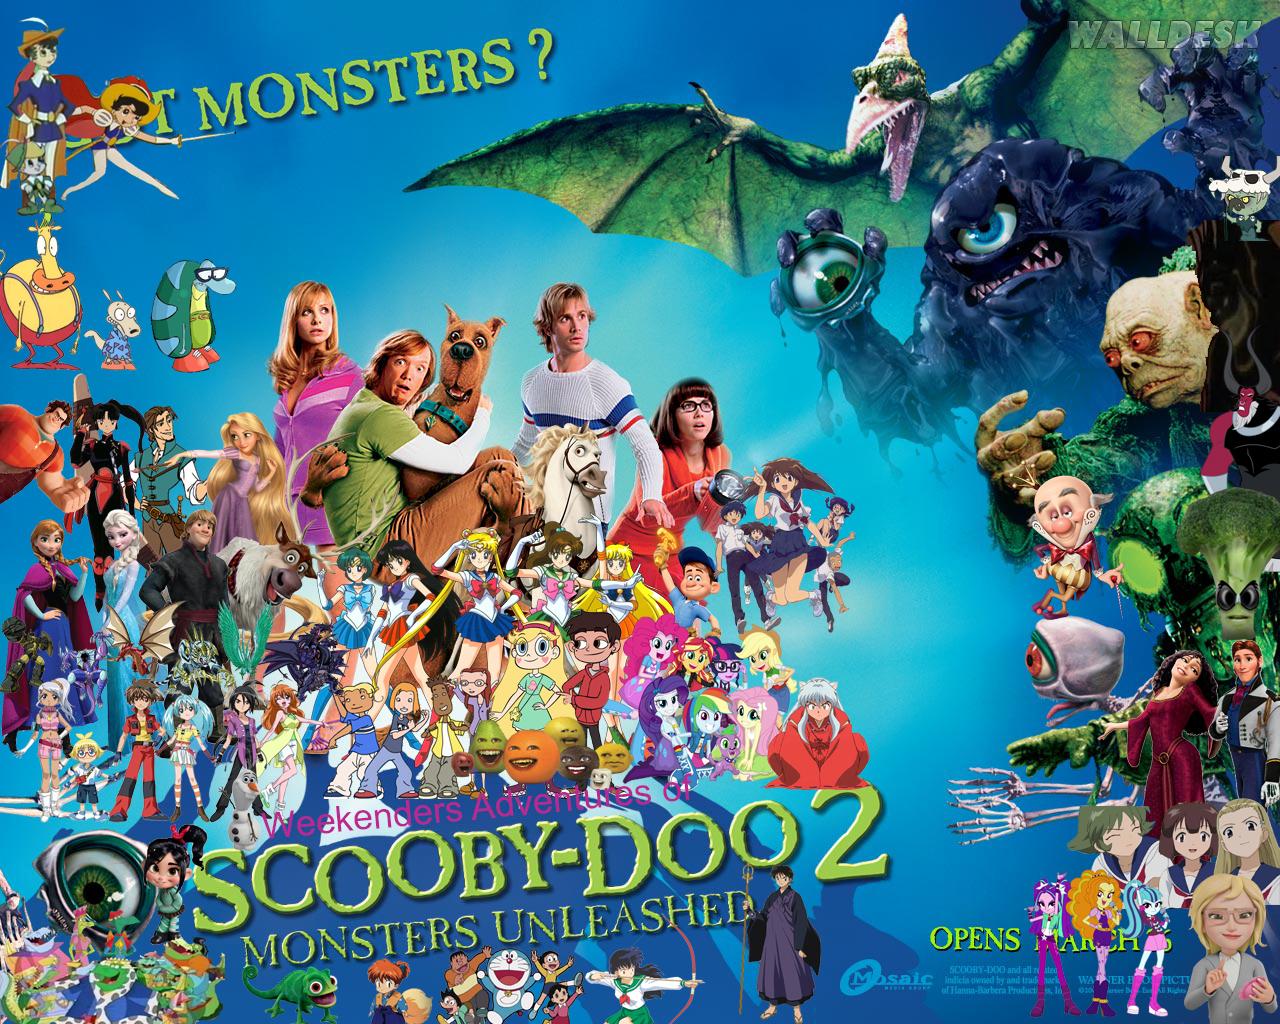 Wonderful Wallpaper Halloween Scooby Doo - latest?cb\u003d20170526173729  Image_426614.jpg/revision/latest?cb\u003d20170526173729